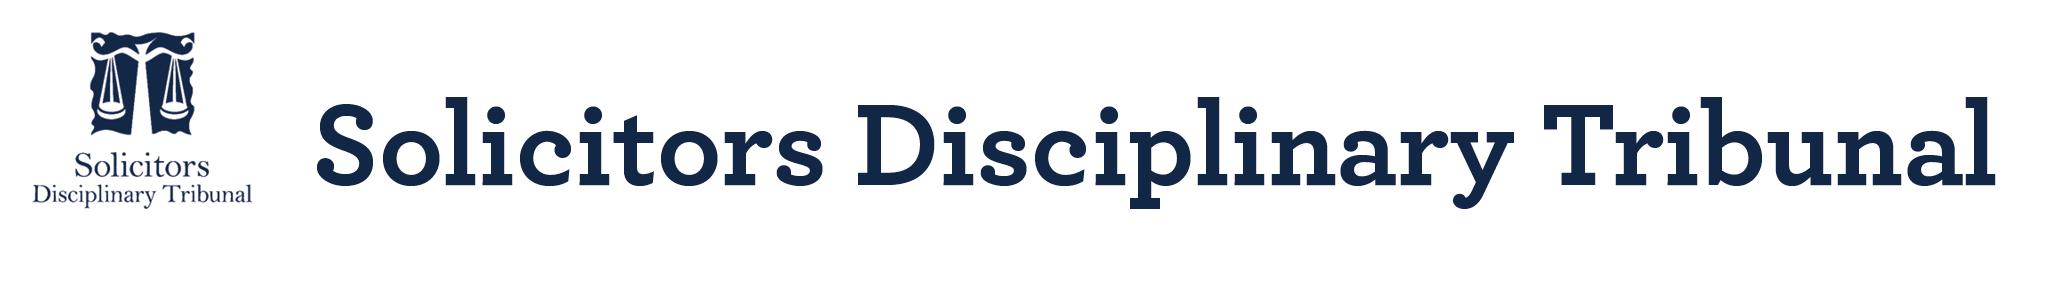 Solicitor's Disciplinary Tribunal